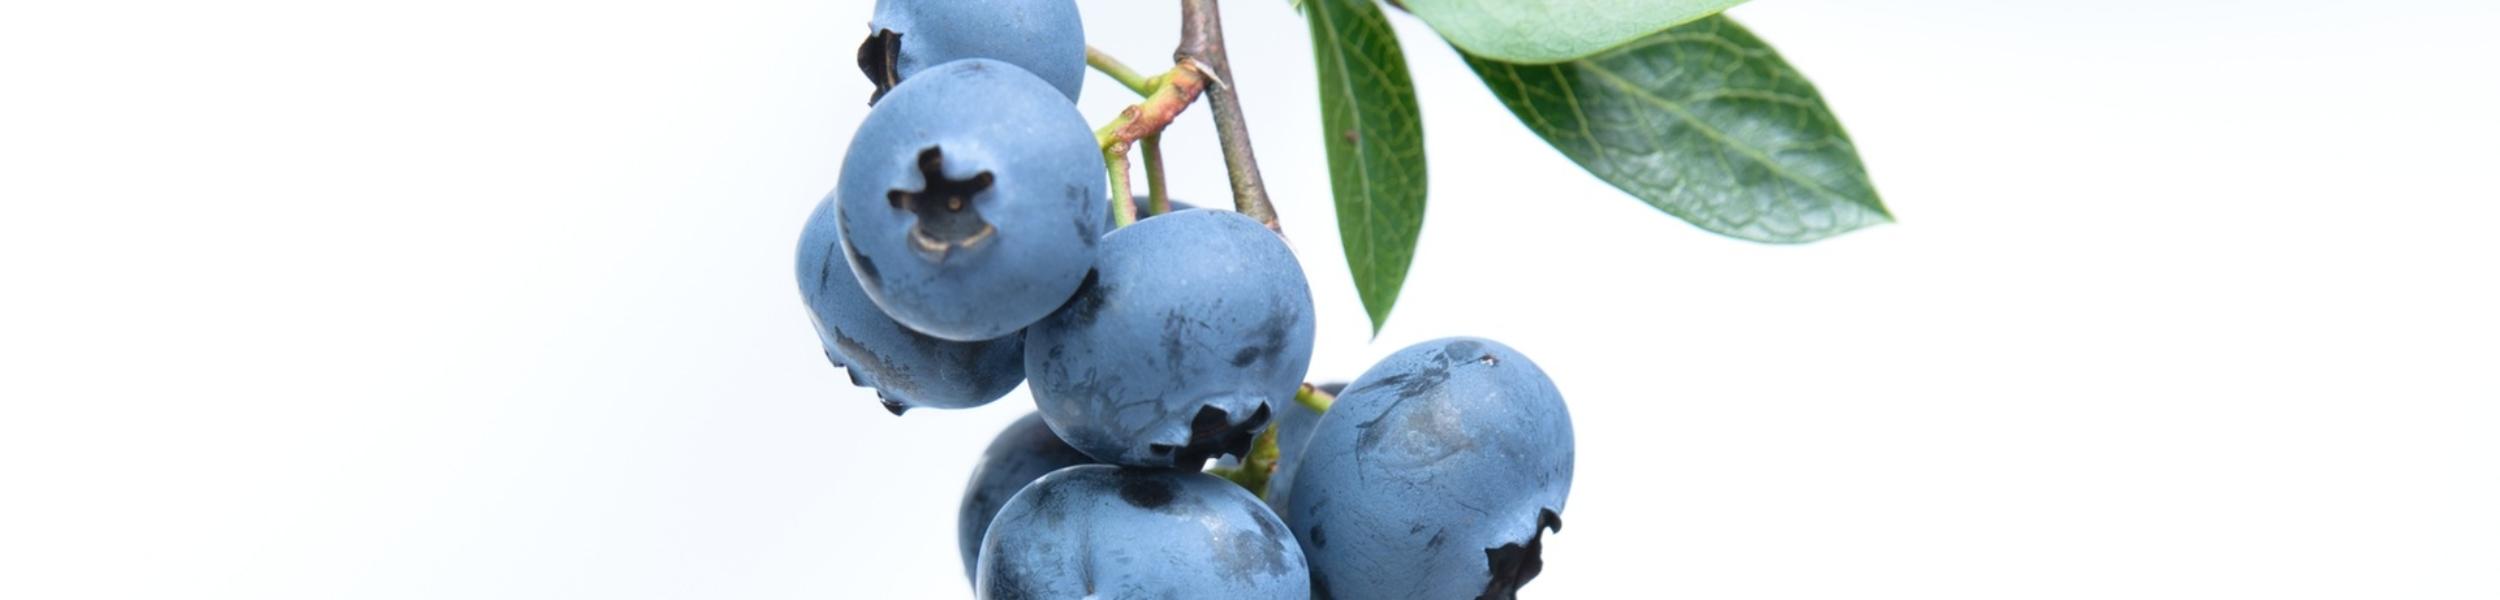 blueberry-fruit-blue-45908